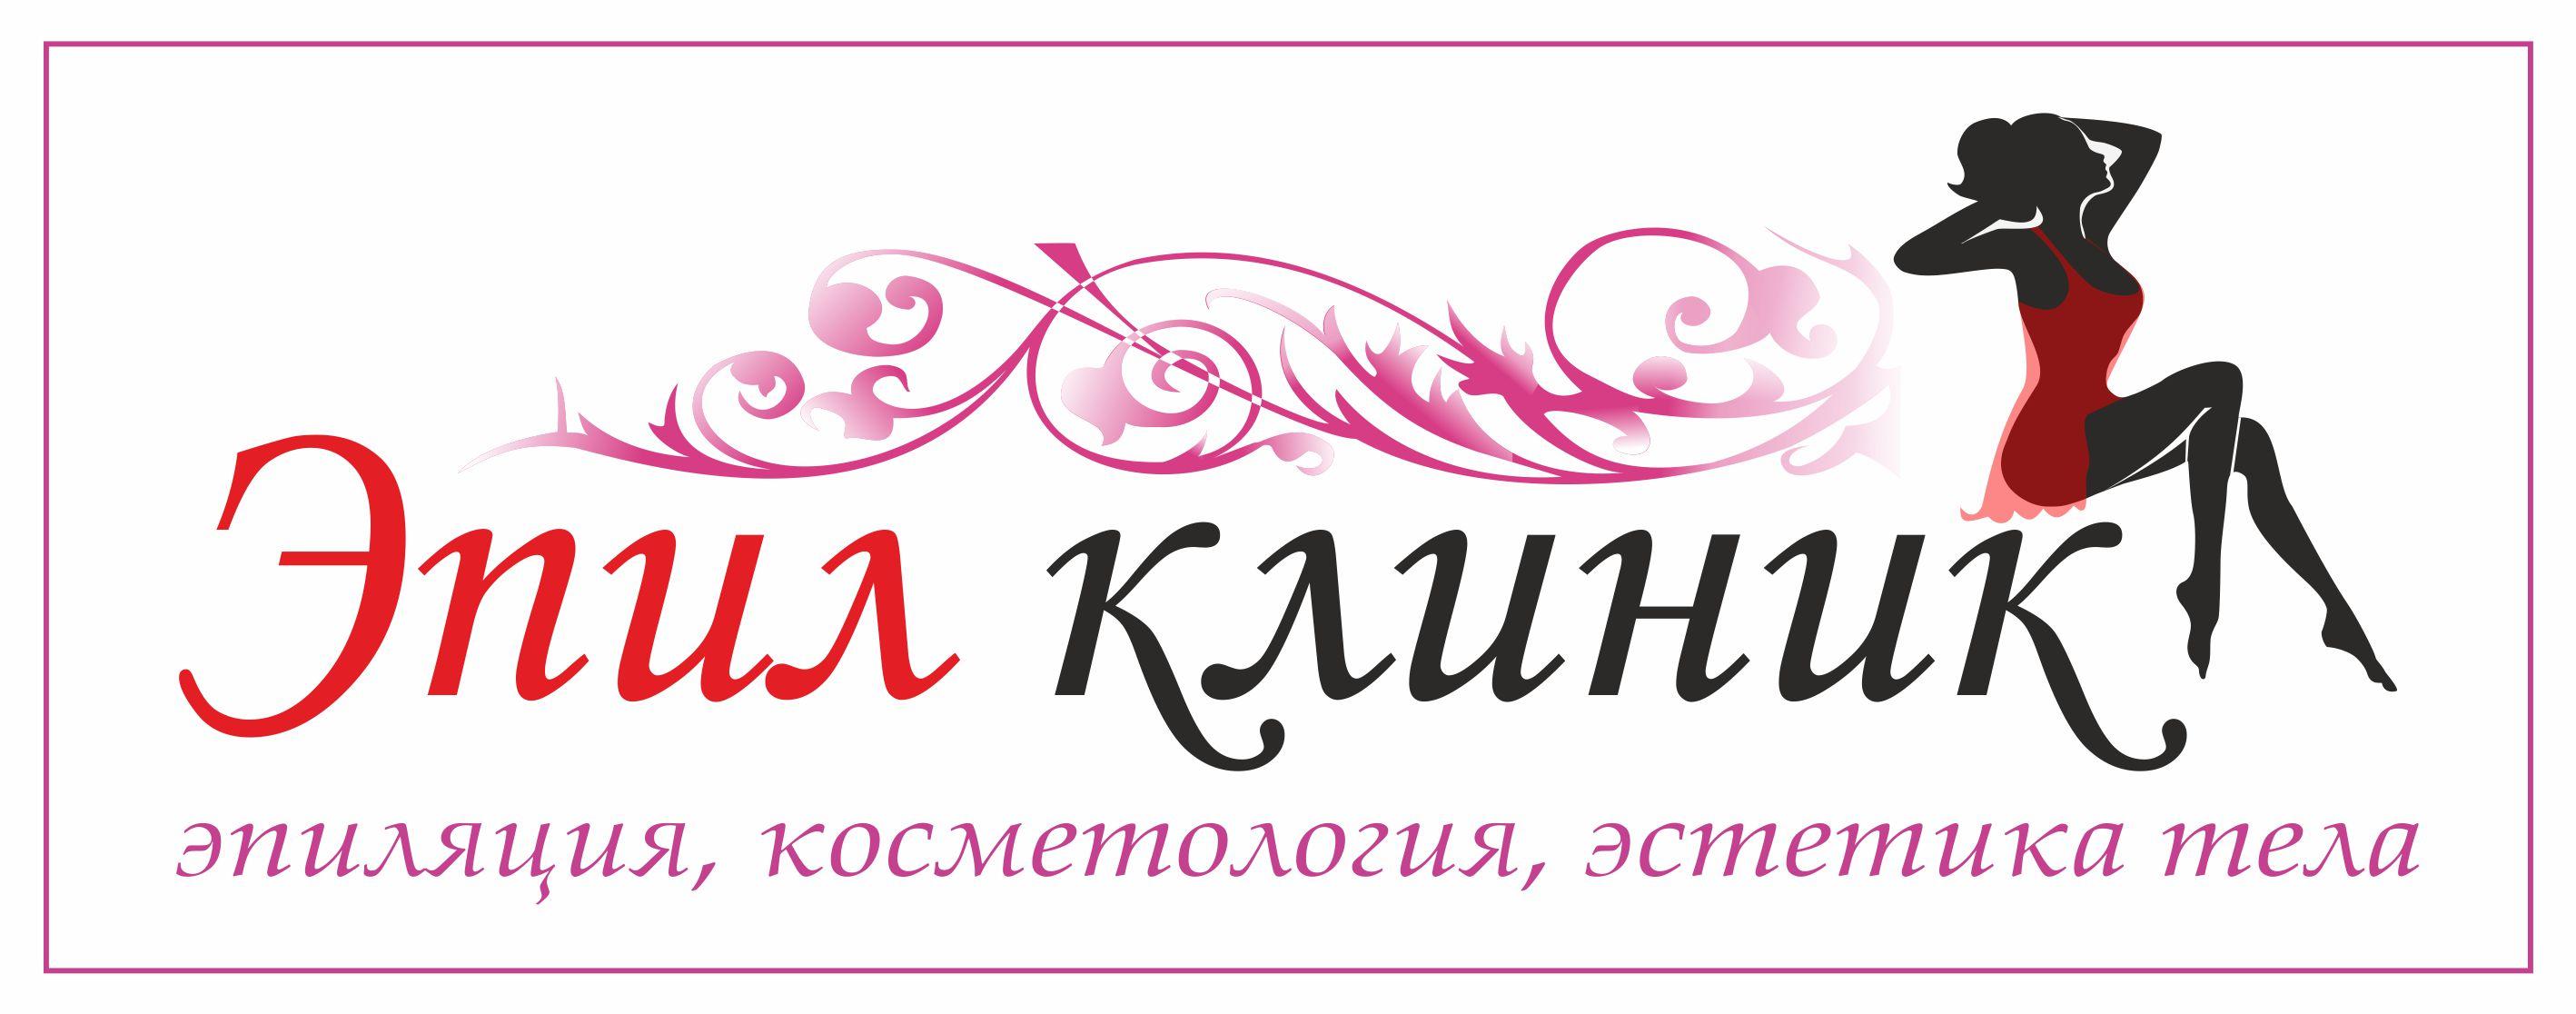 Логотип , фирменный стиль  фото f_5315e18122a71826.jpg